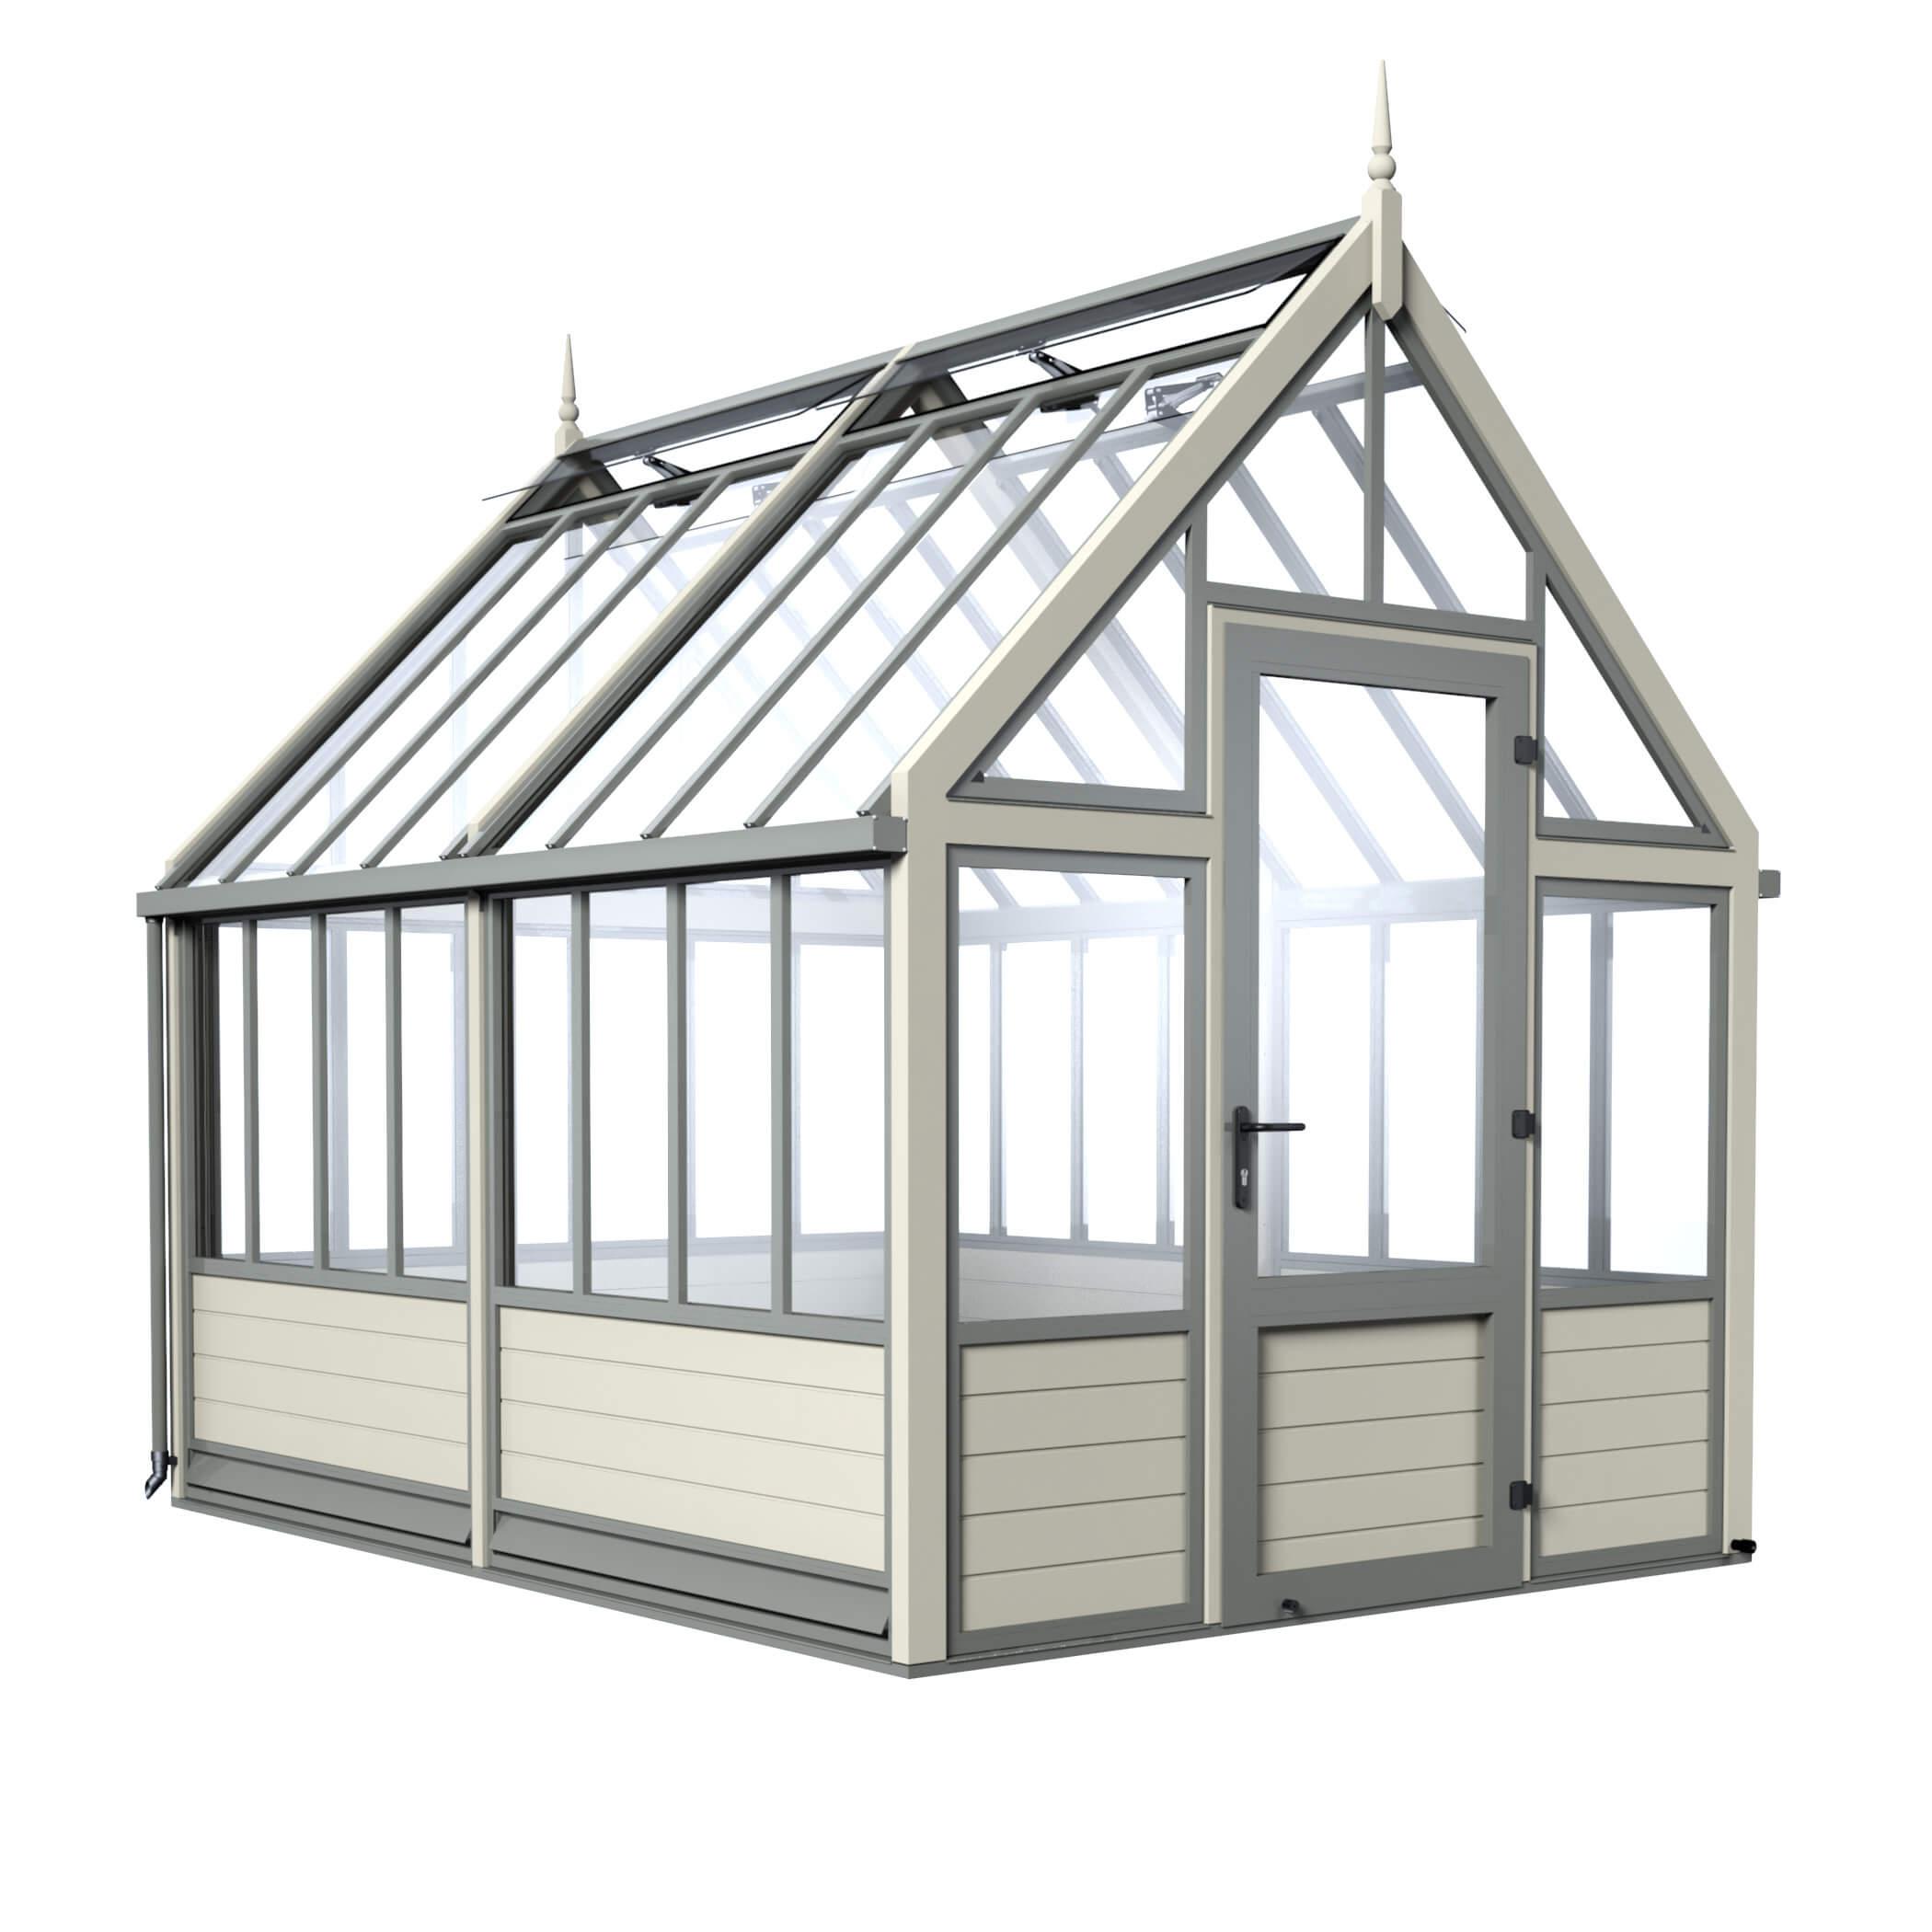 Aluminium Greenhouses | Metal Greenhouses | Cultivar UK